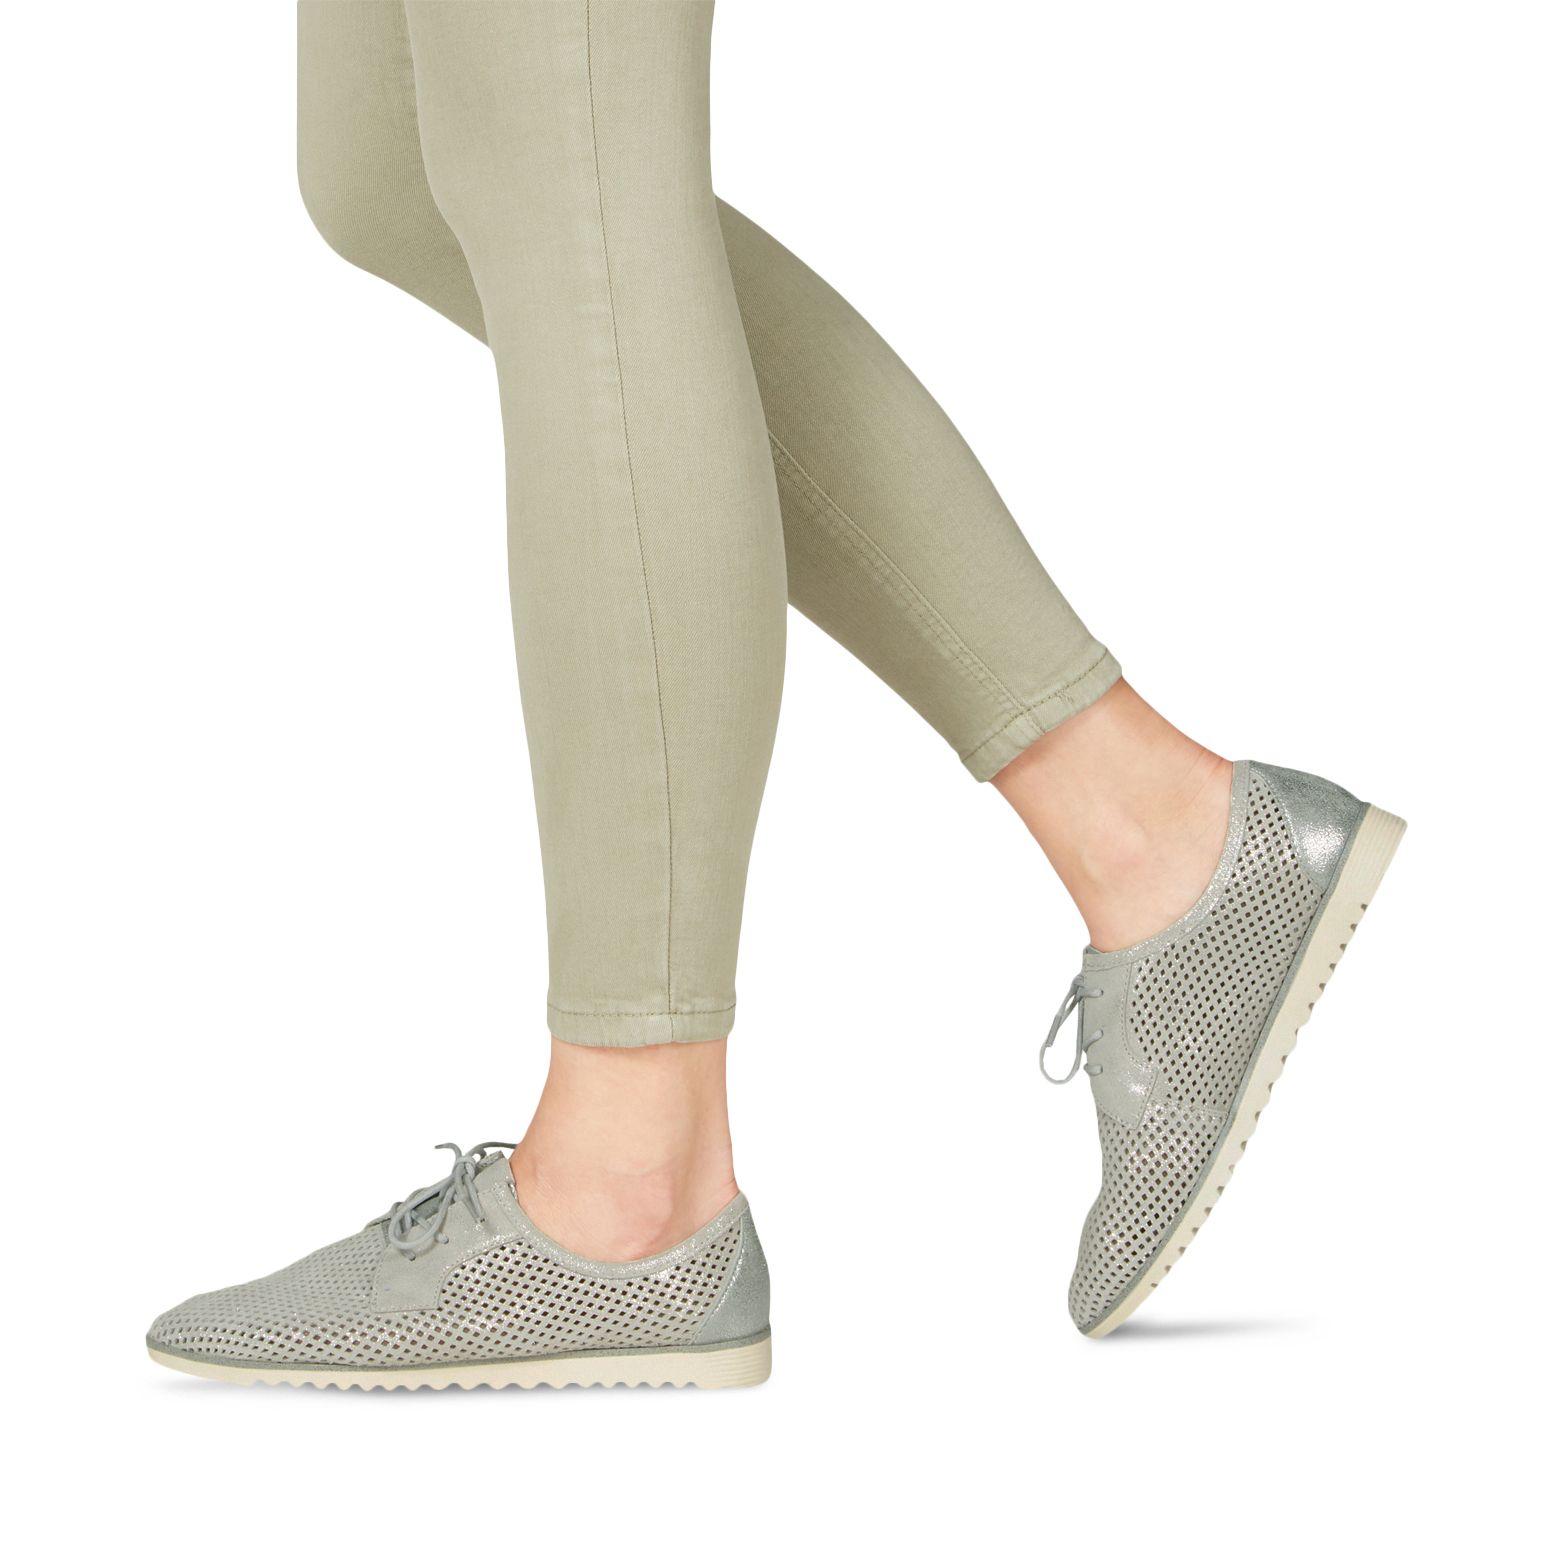 NEU: Tamaris Schnürer 1 1 23603 20 100 white | Schuhe